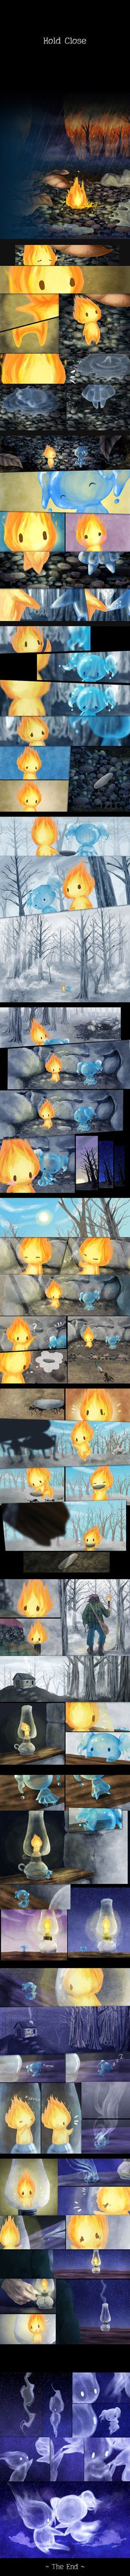 cute! water, stori, hold close, stuff, art, twilight, random, ador, thing